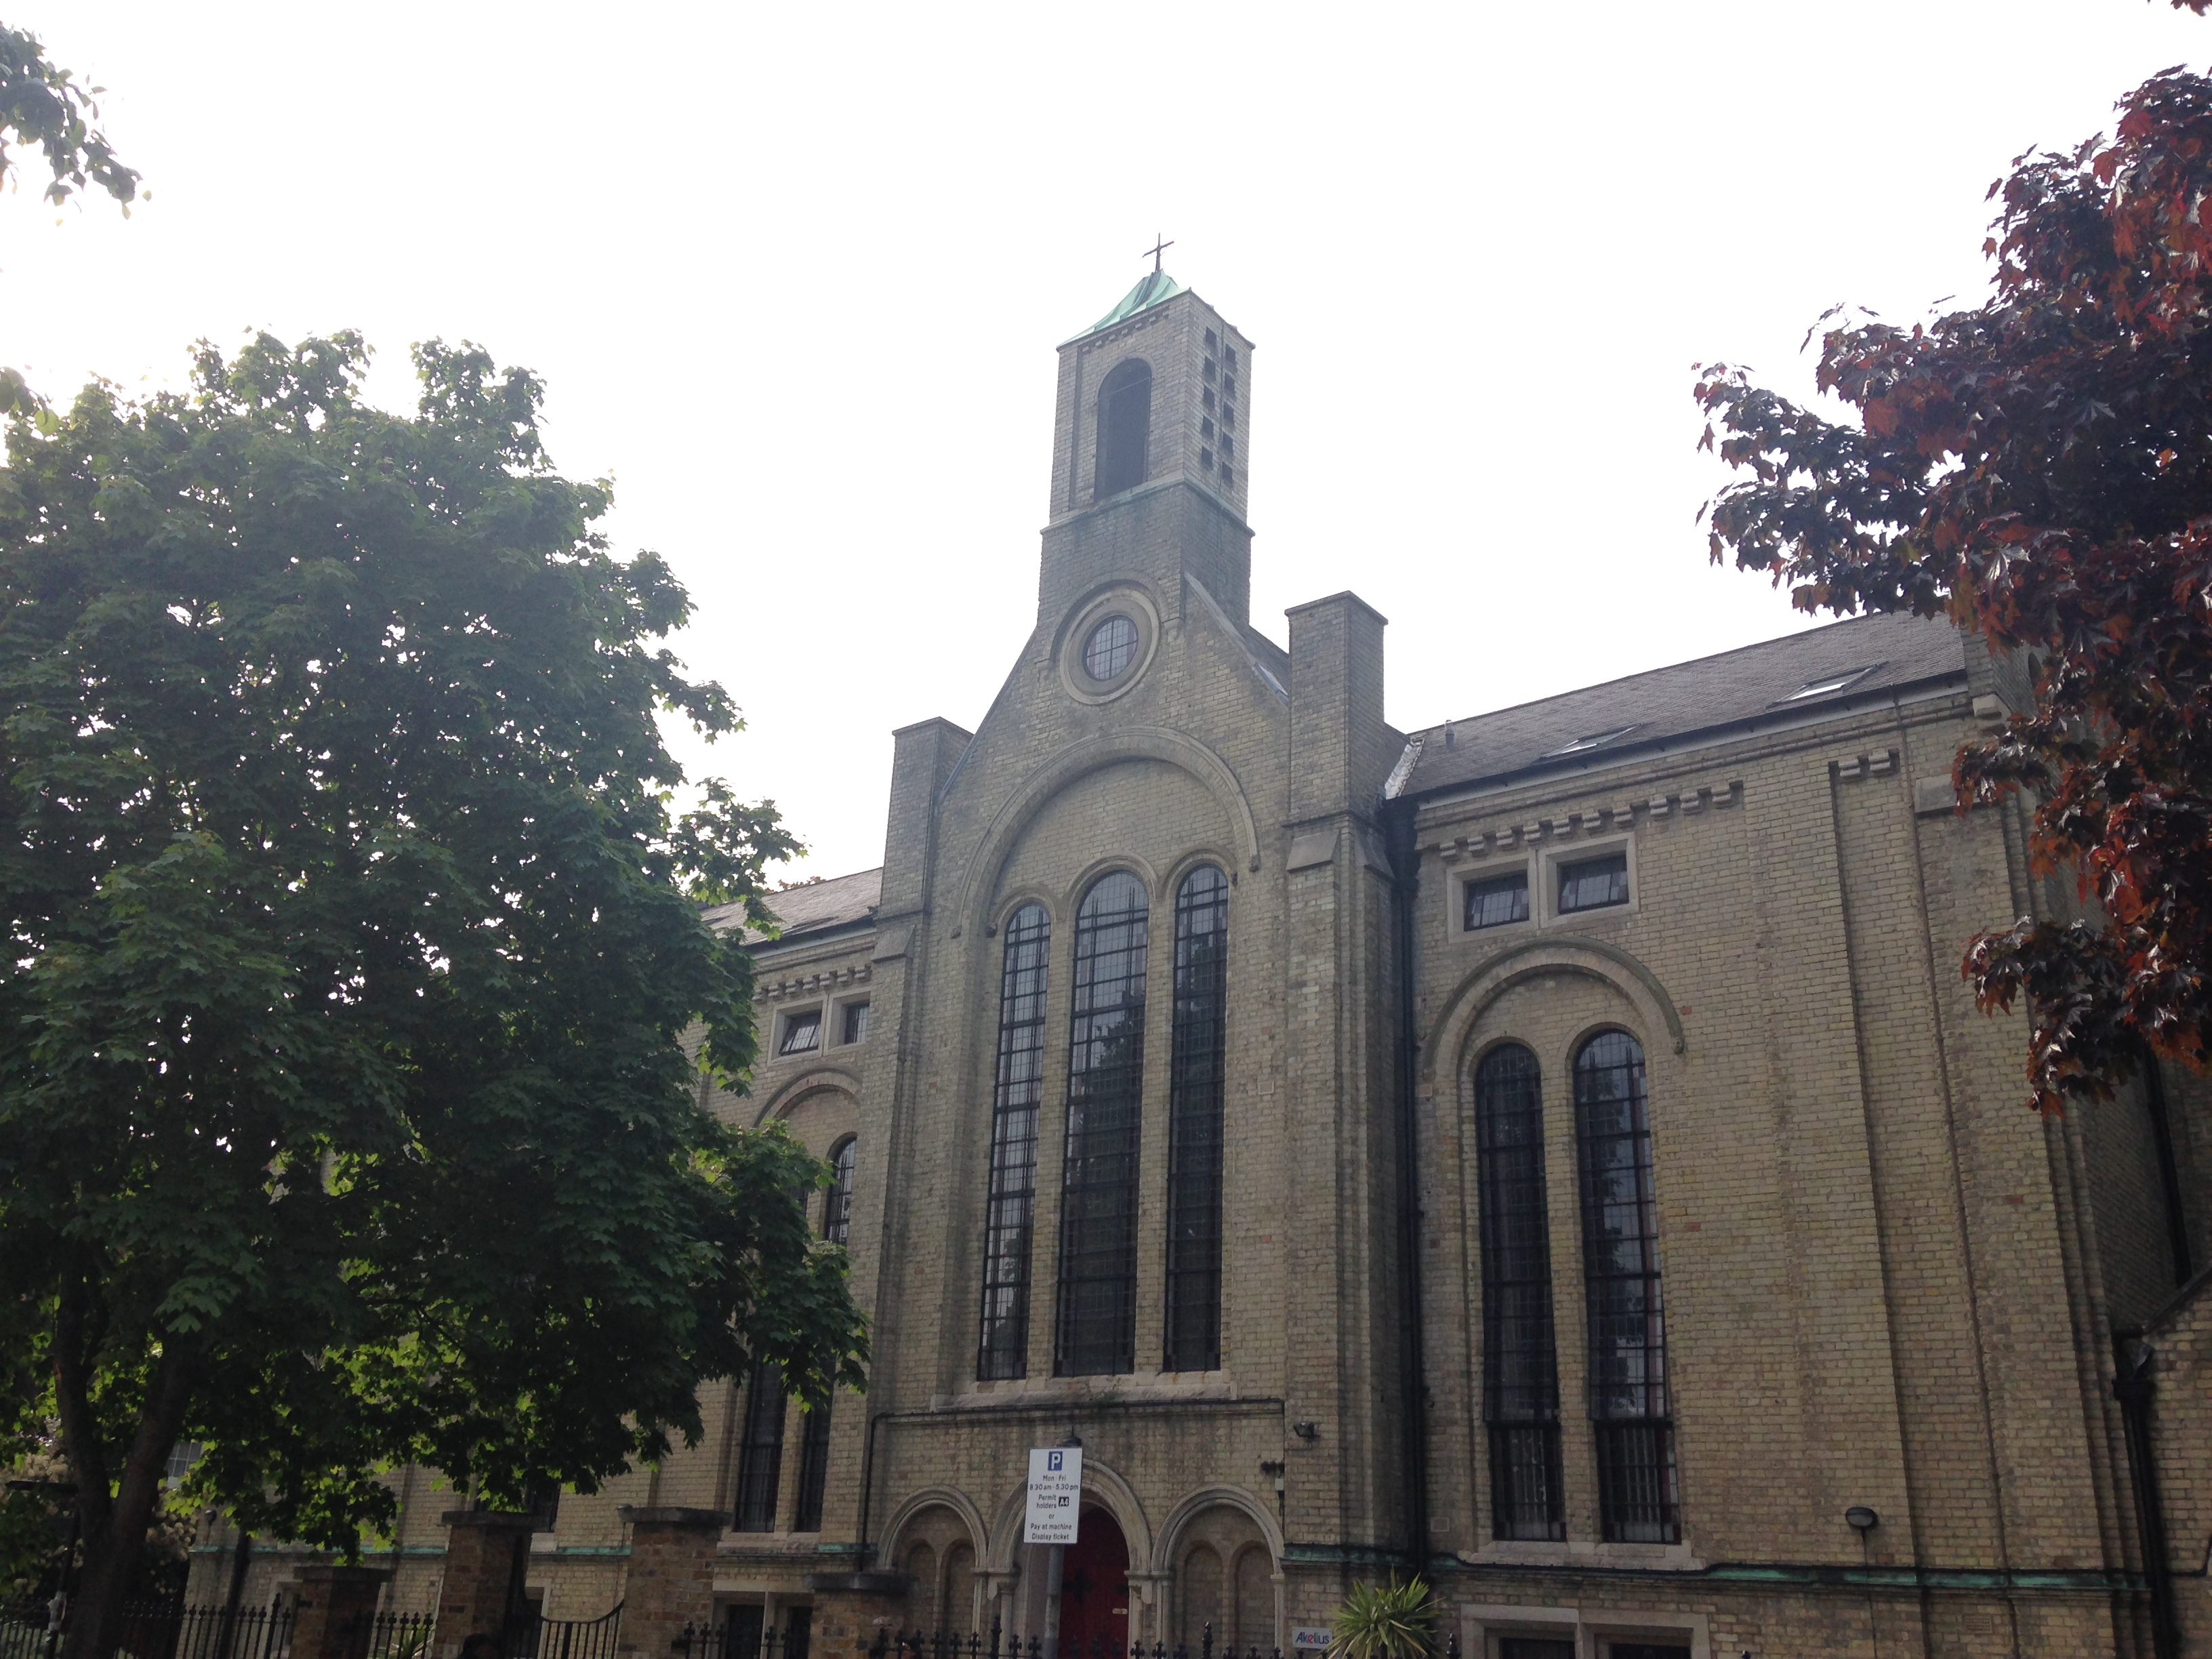 ST. PETER'S CHURCH, CEPHAS STREET